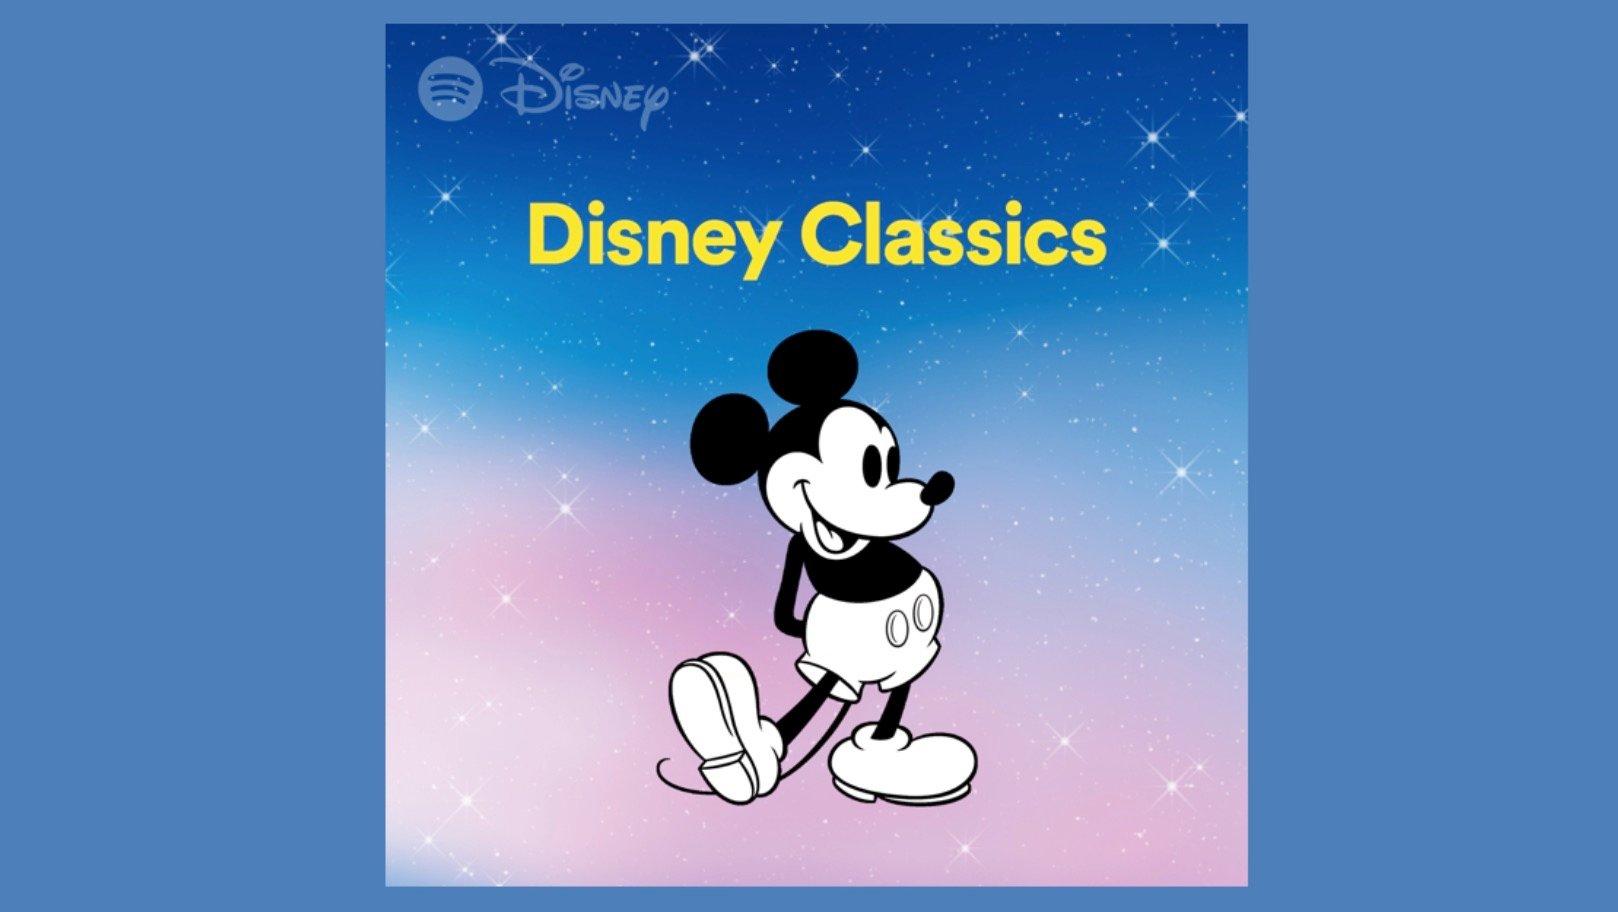 spotify disney hub 150x150 - Spotify's Disney Hub offers tunes from Star Wars, Frozen, Marvel and other popular Disney franchises